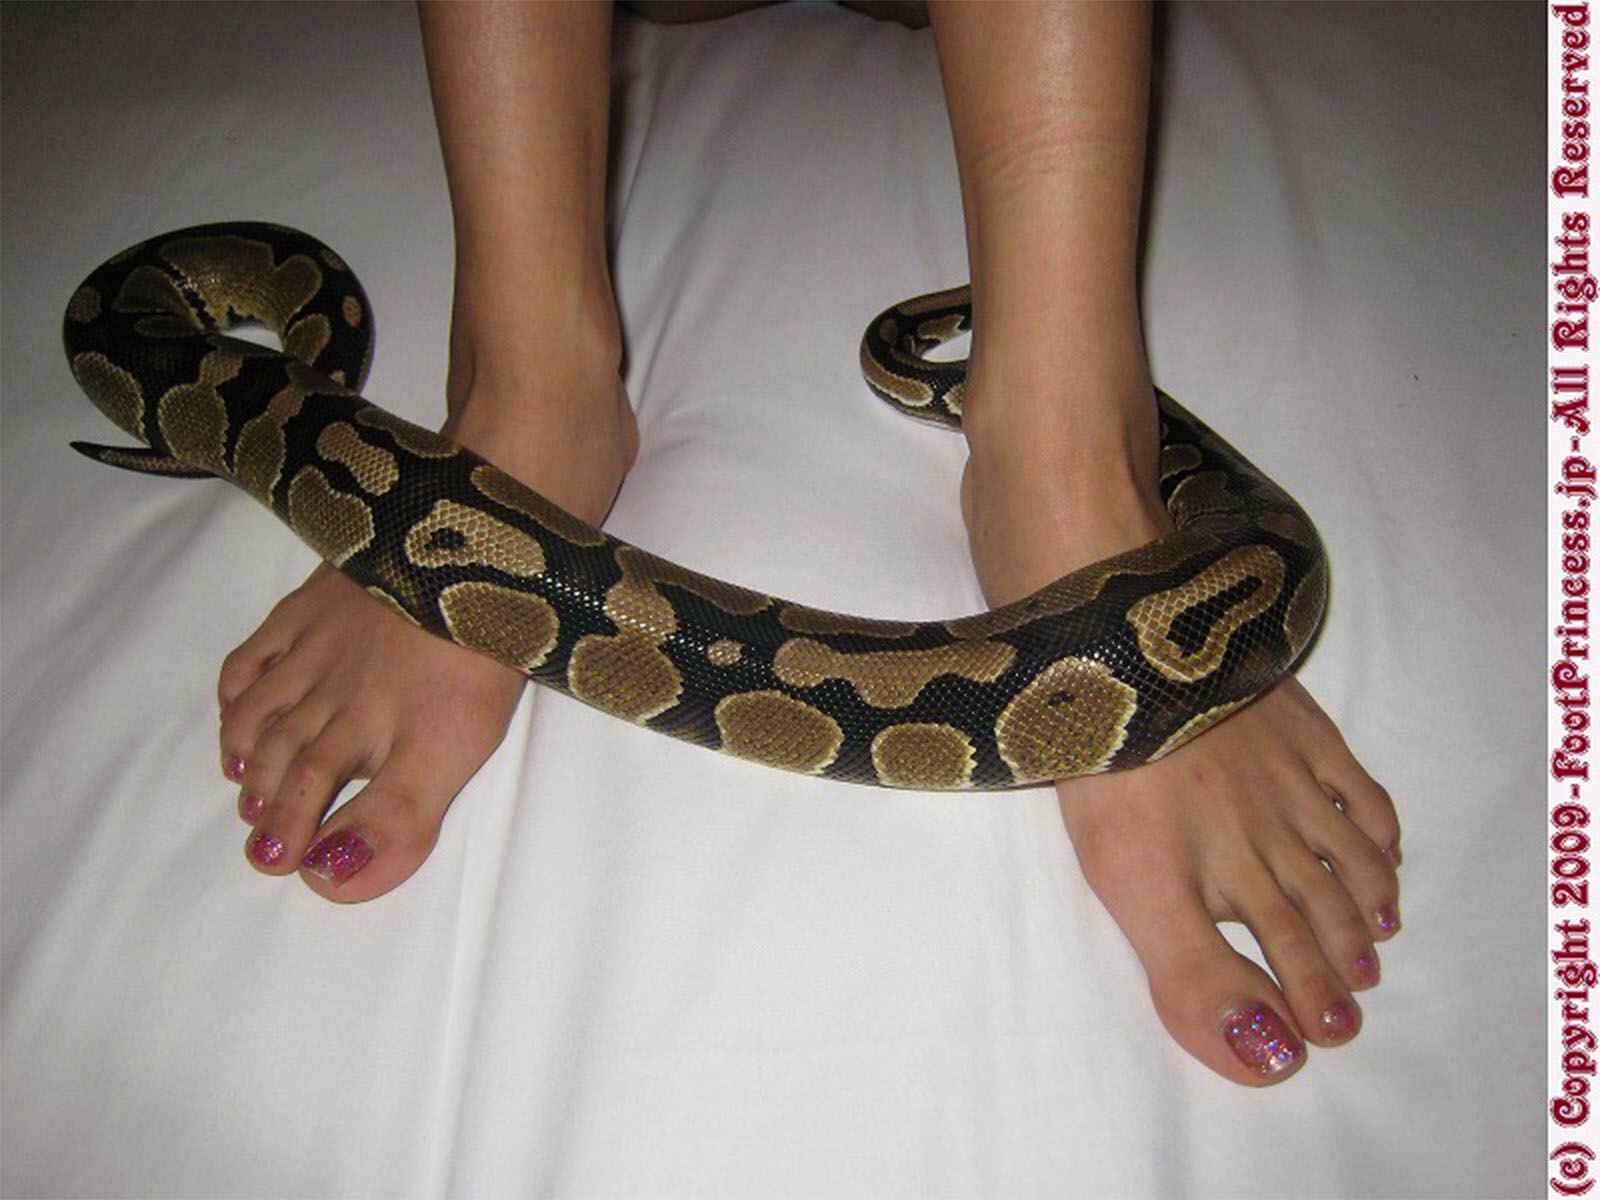 Mascota masajea mis pies